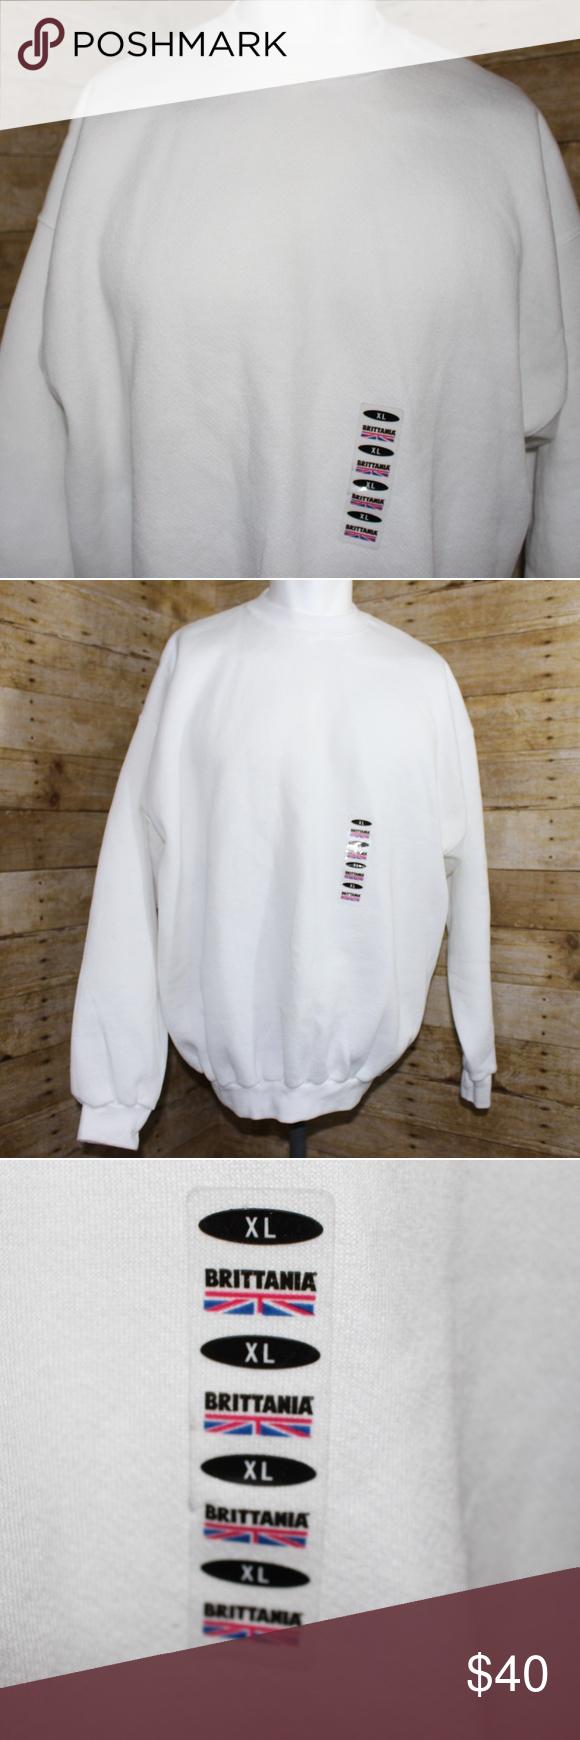 Vintage Brittania Levi Strauss Company Sweatshirt Sweatshirts Vintage Sweatshirt Sweatshirt Shirt [ 1740 x 580 Pixel ]